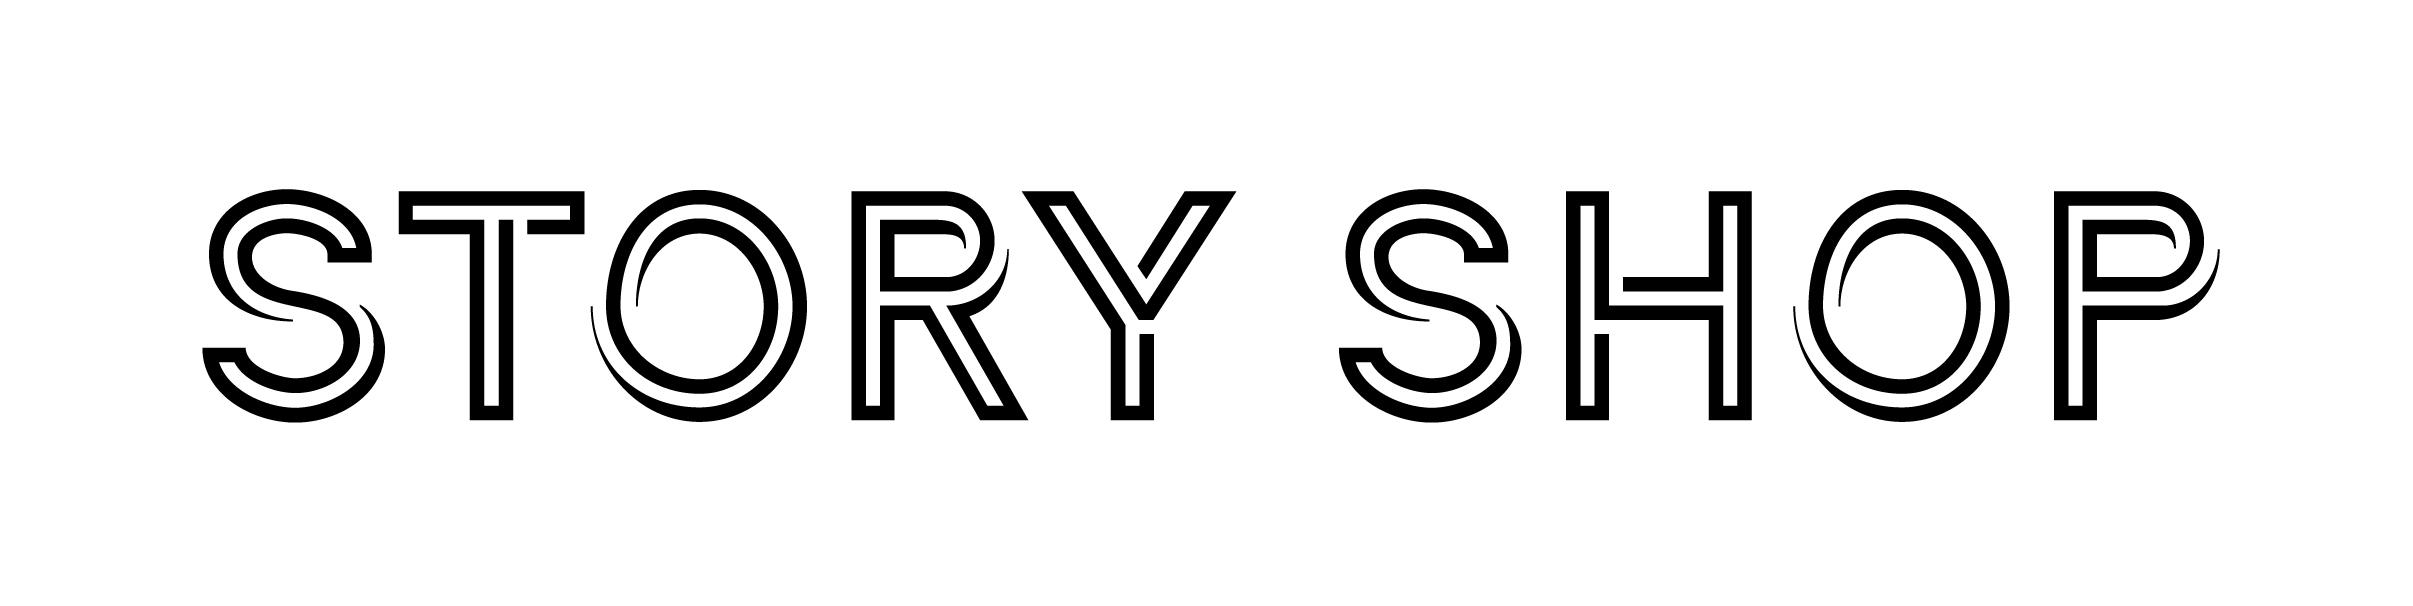 story shop logo_print.jpg